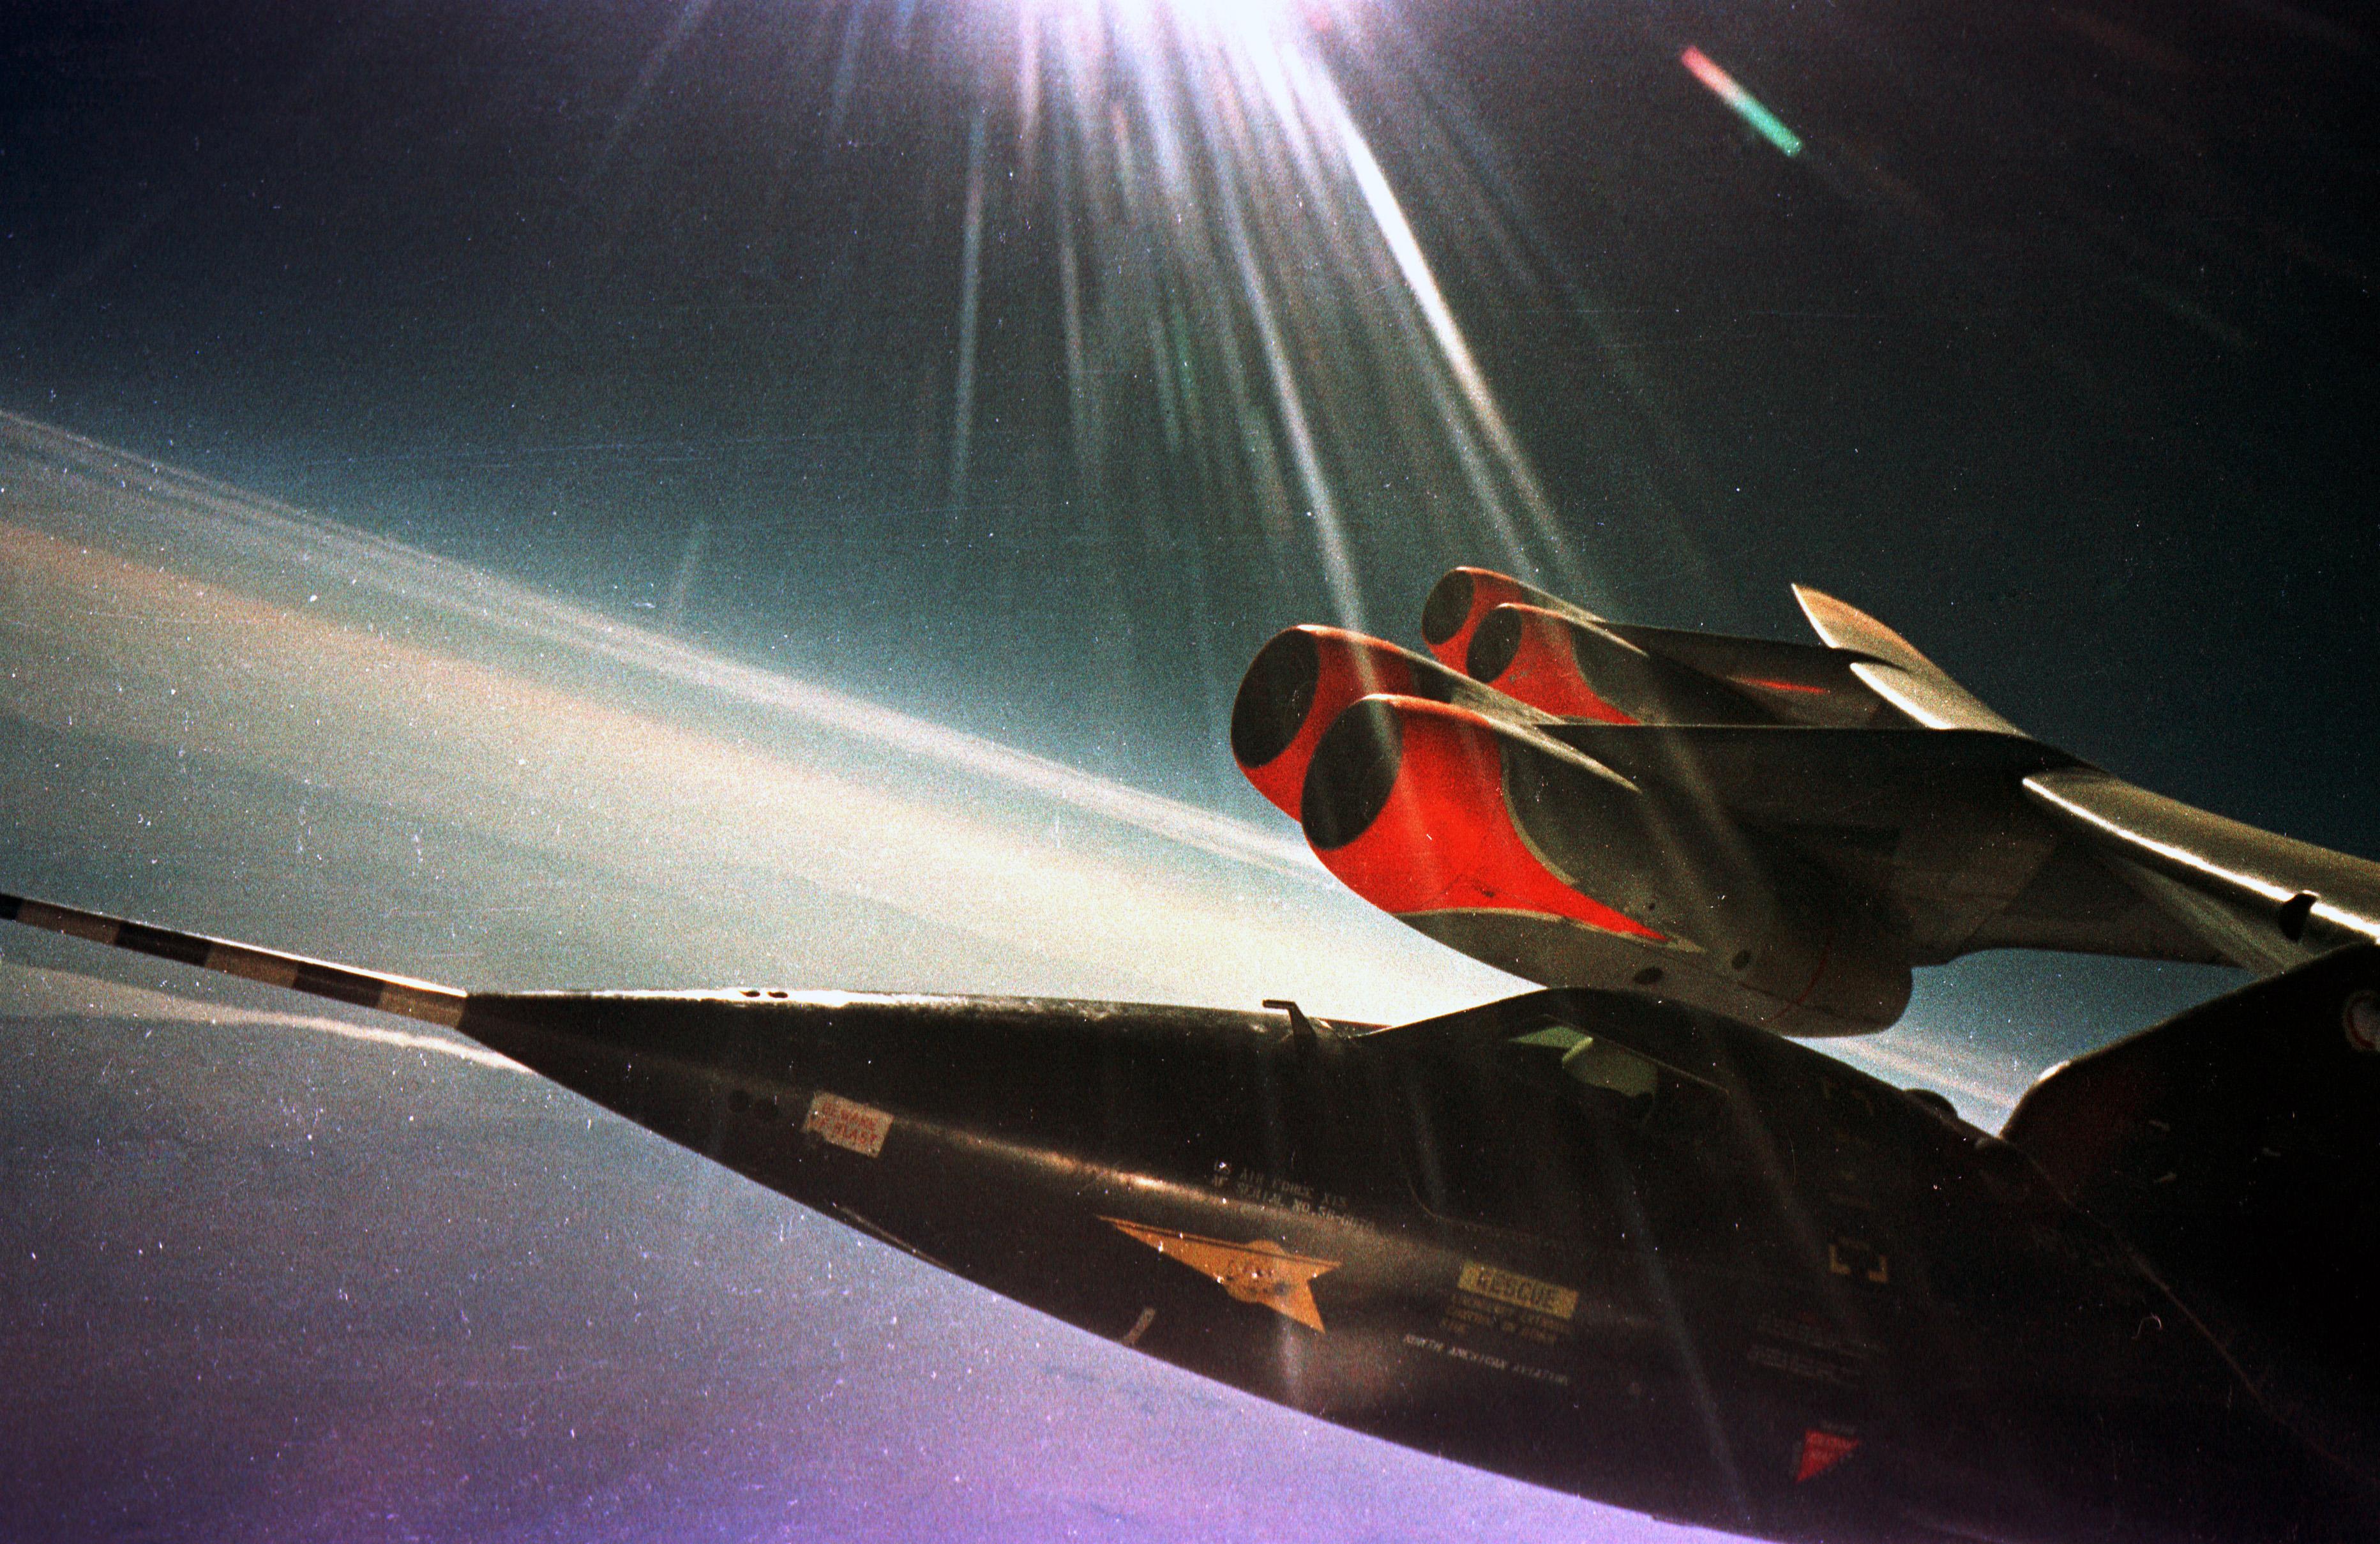 Nibiru in unserem Sonnensystem  NASA lockert